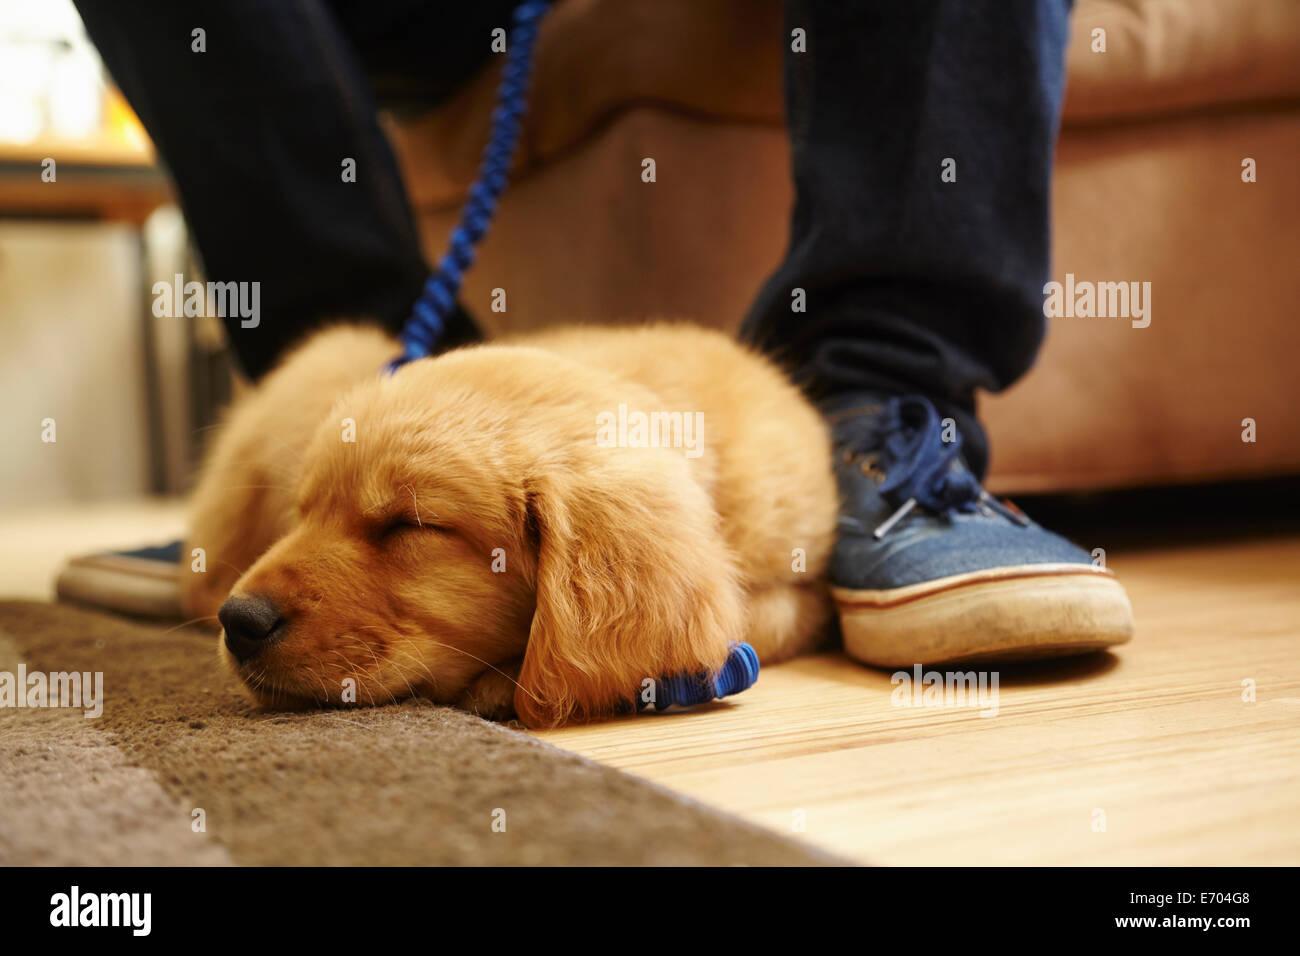 Labrador puppy asleep at feet - Stock Image